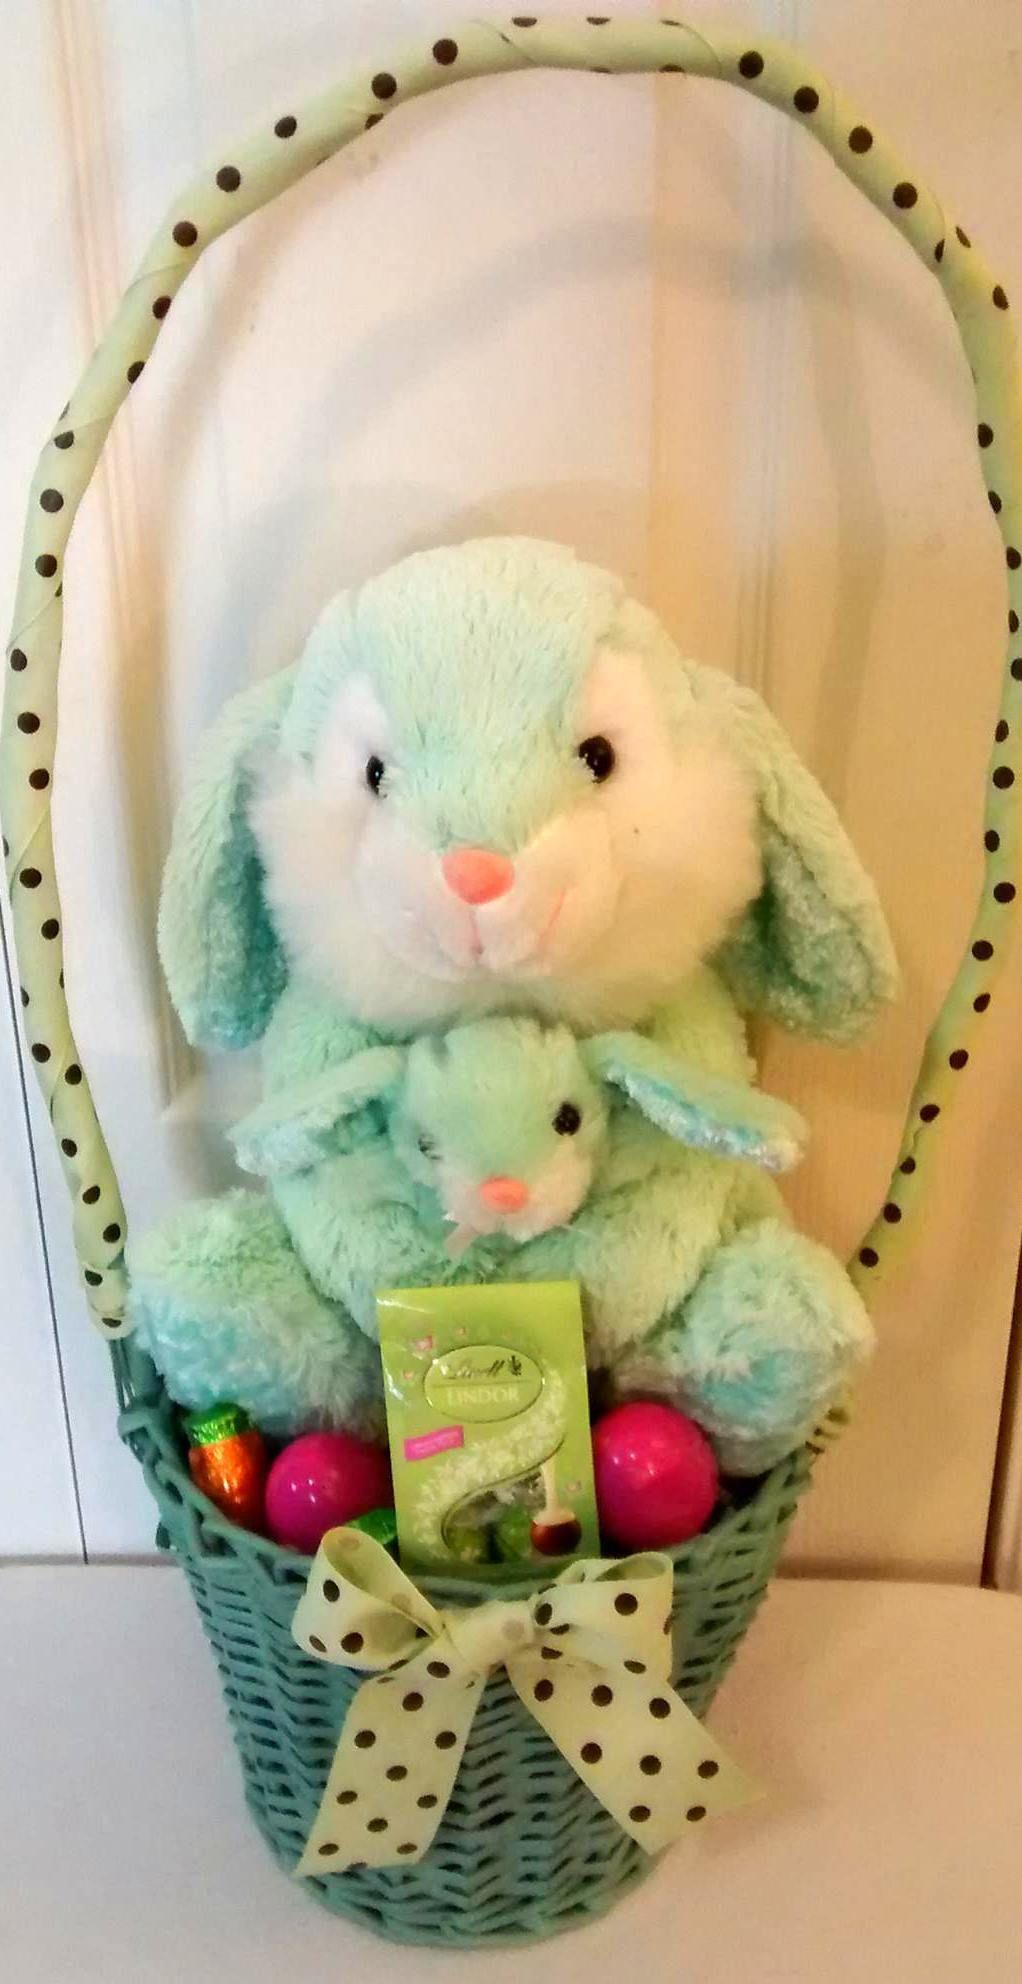 Light blue mom baby bunny easter gift basket 25 all payments light blue mom baby bunny easter gift basket 25 all payments through paypal please message negle Choice Image